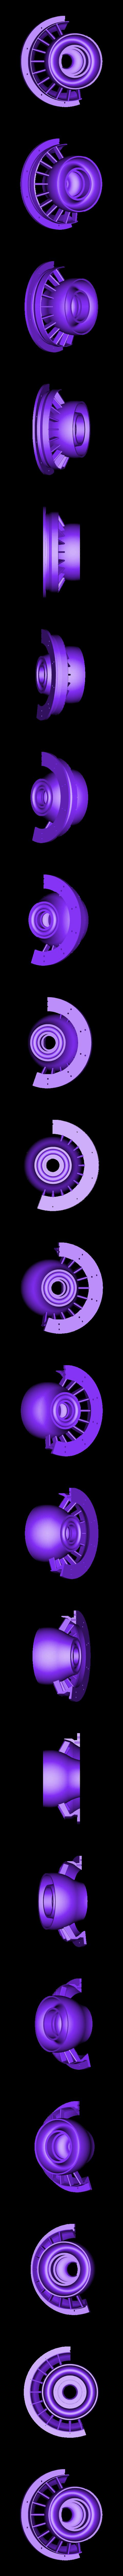 IPC-Inlet-Case101.stl Download free STL file Jet Engine, 3-Spool • 3D printable object, konchan77